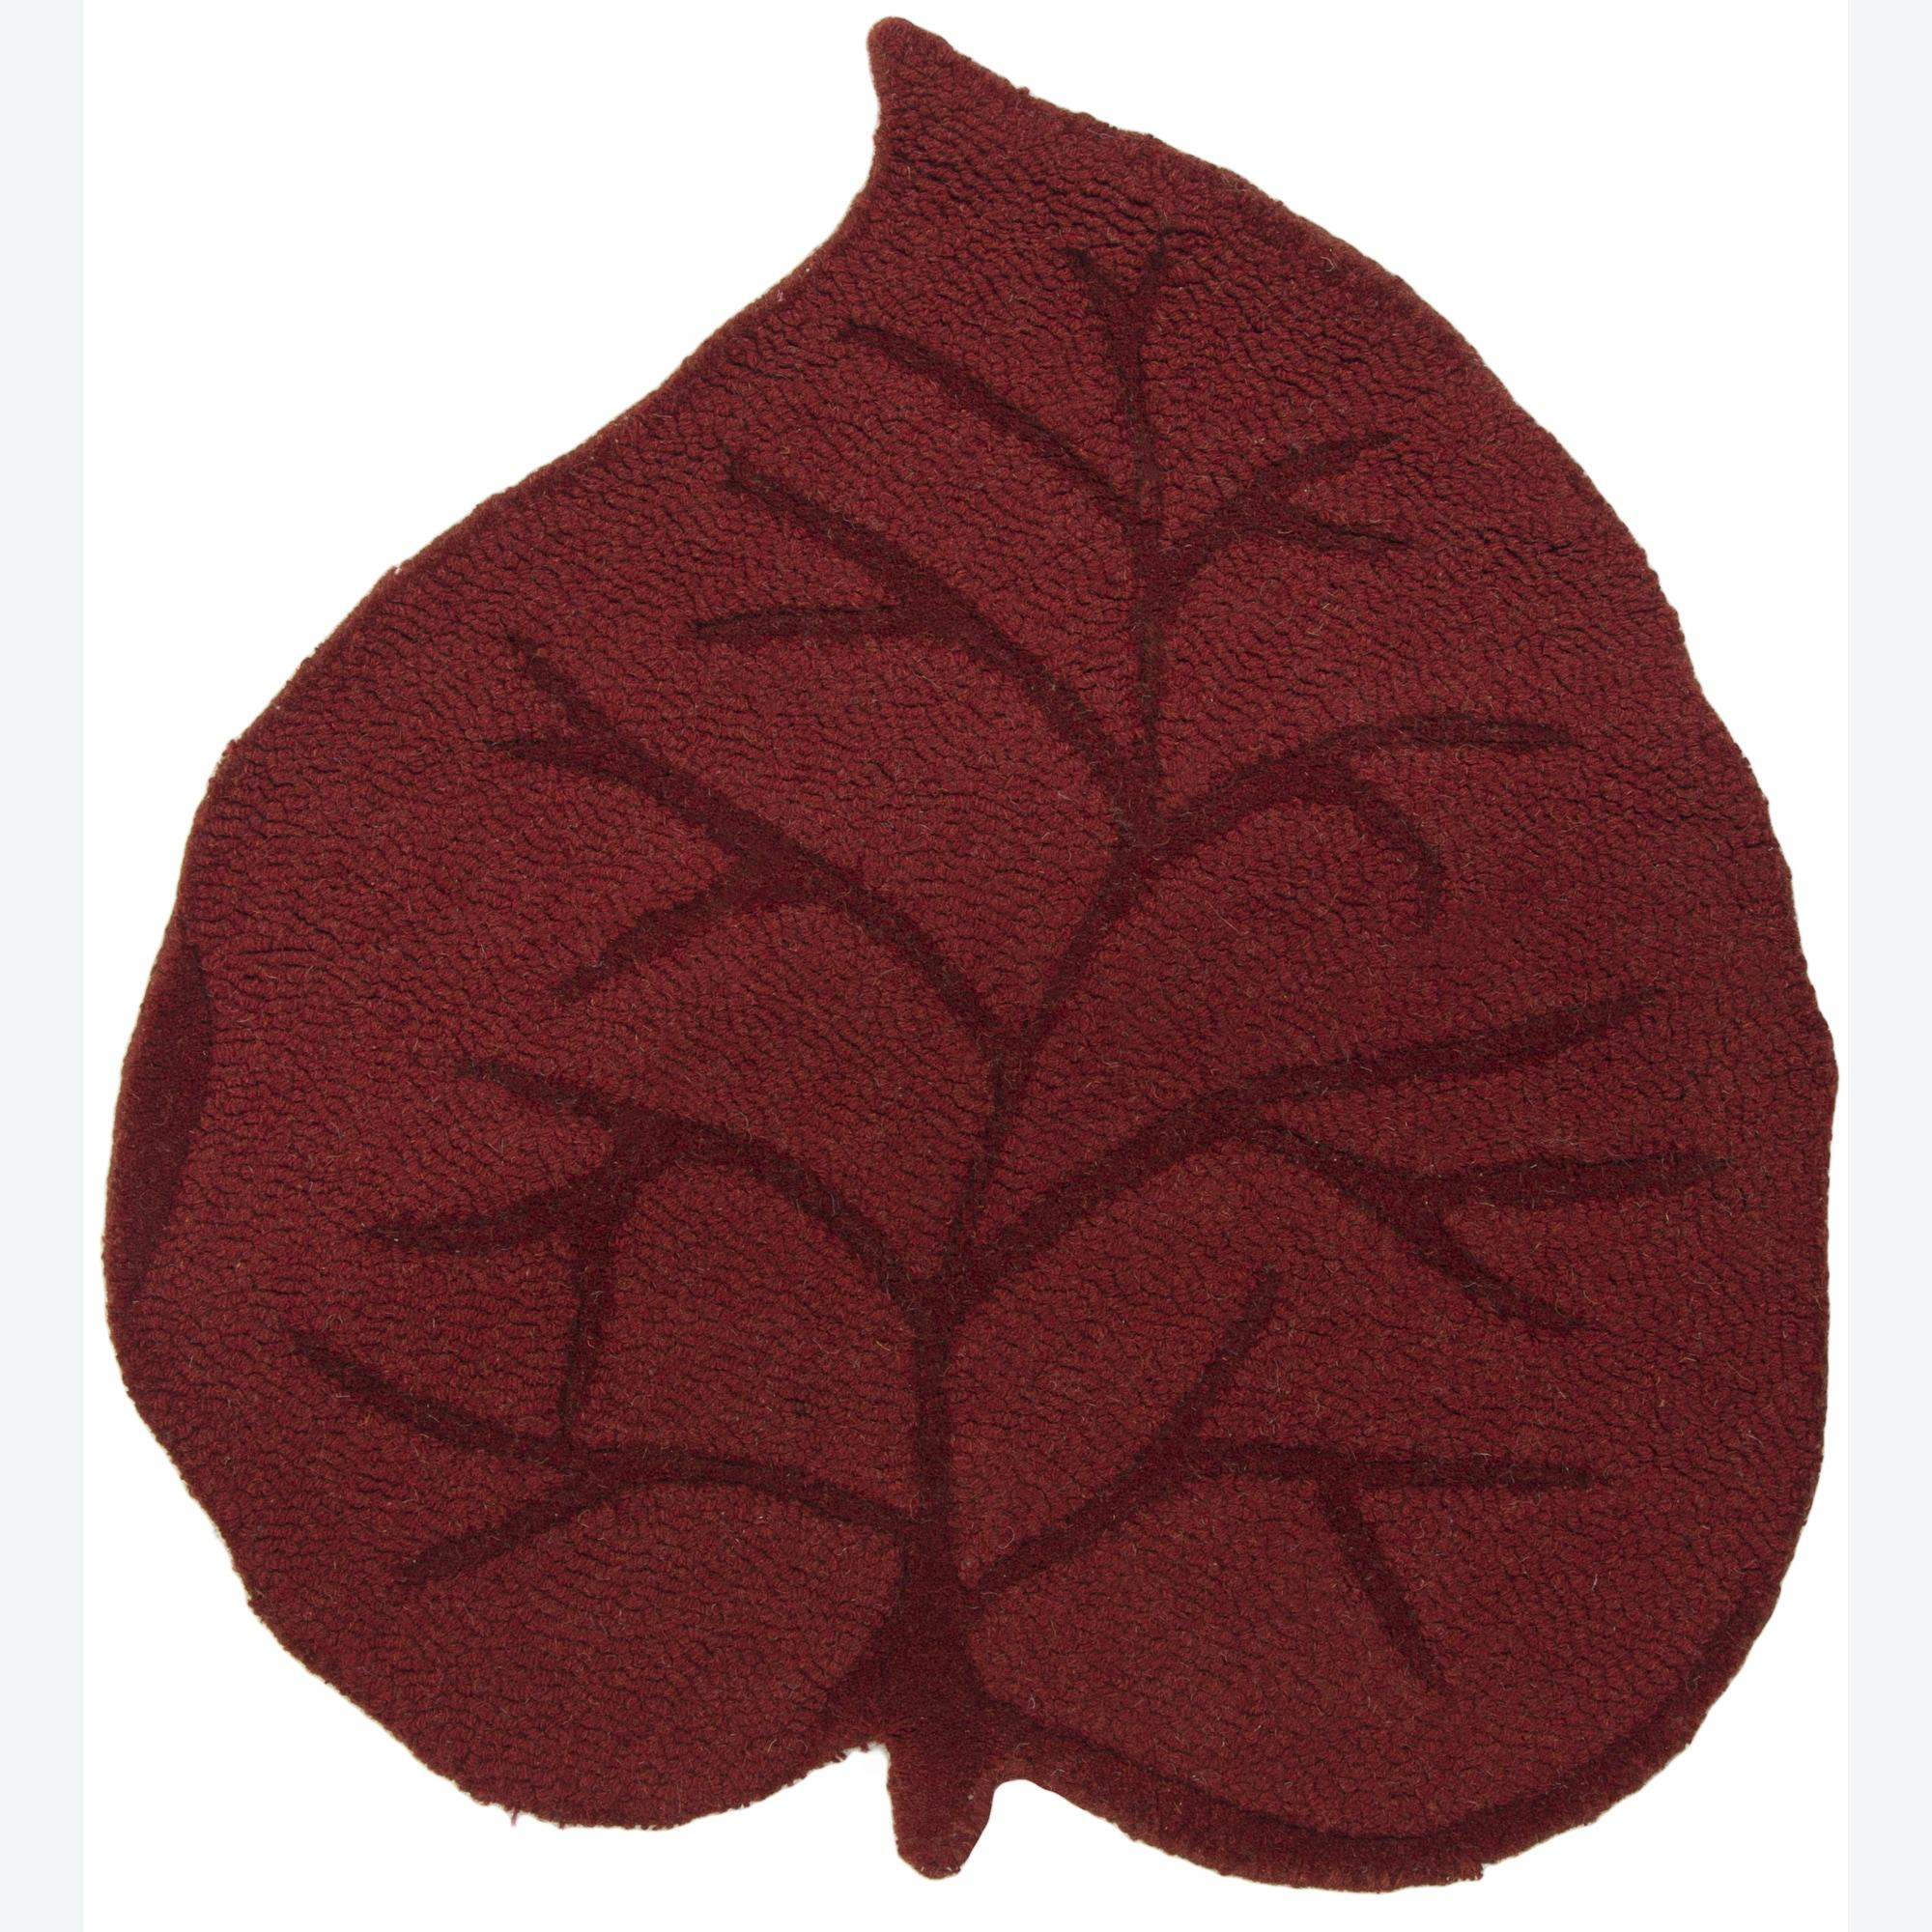 Hand-tufted Mandara Kids Red Leaf Wool Rugs (2'3 x 2'6)